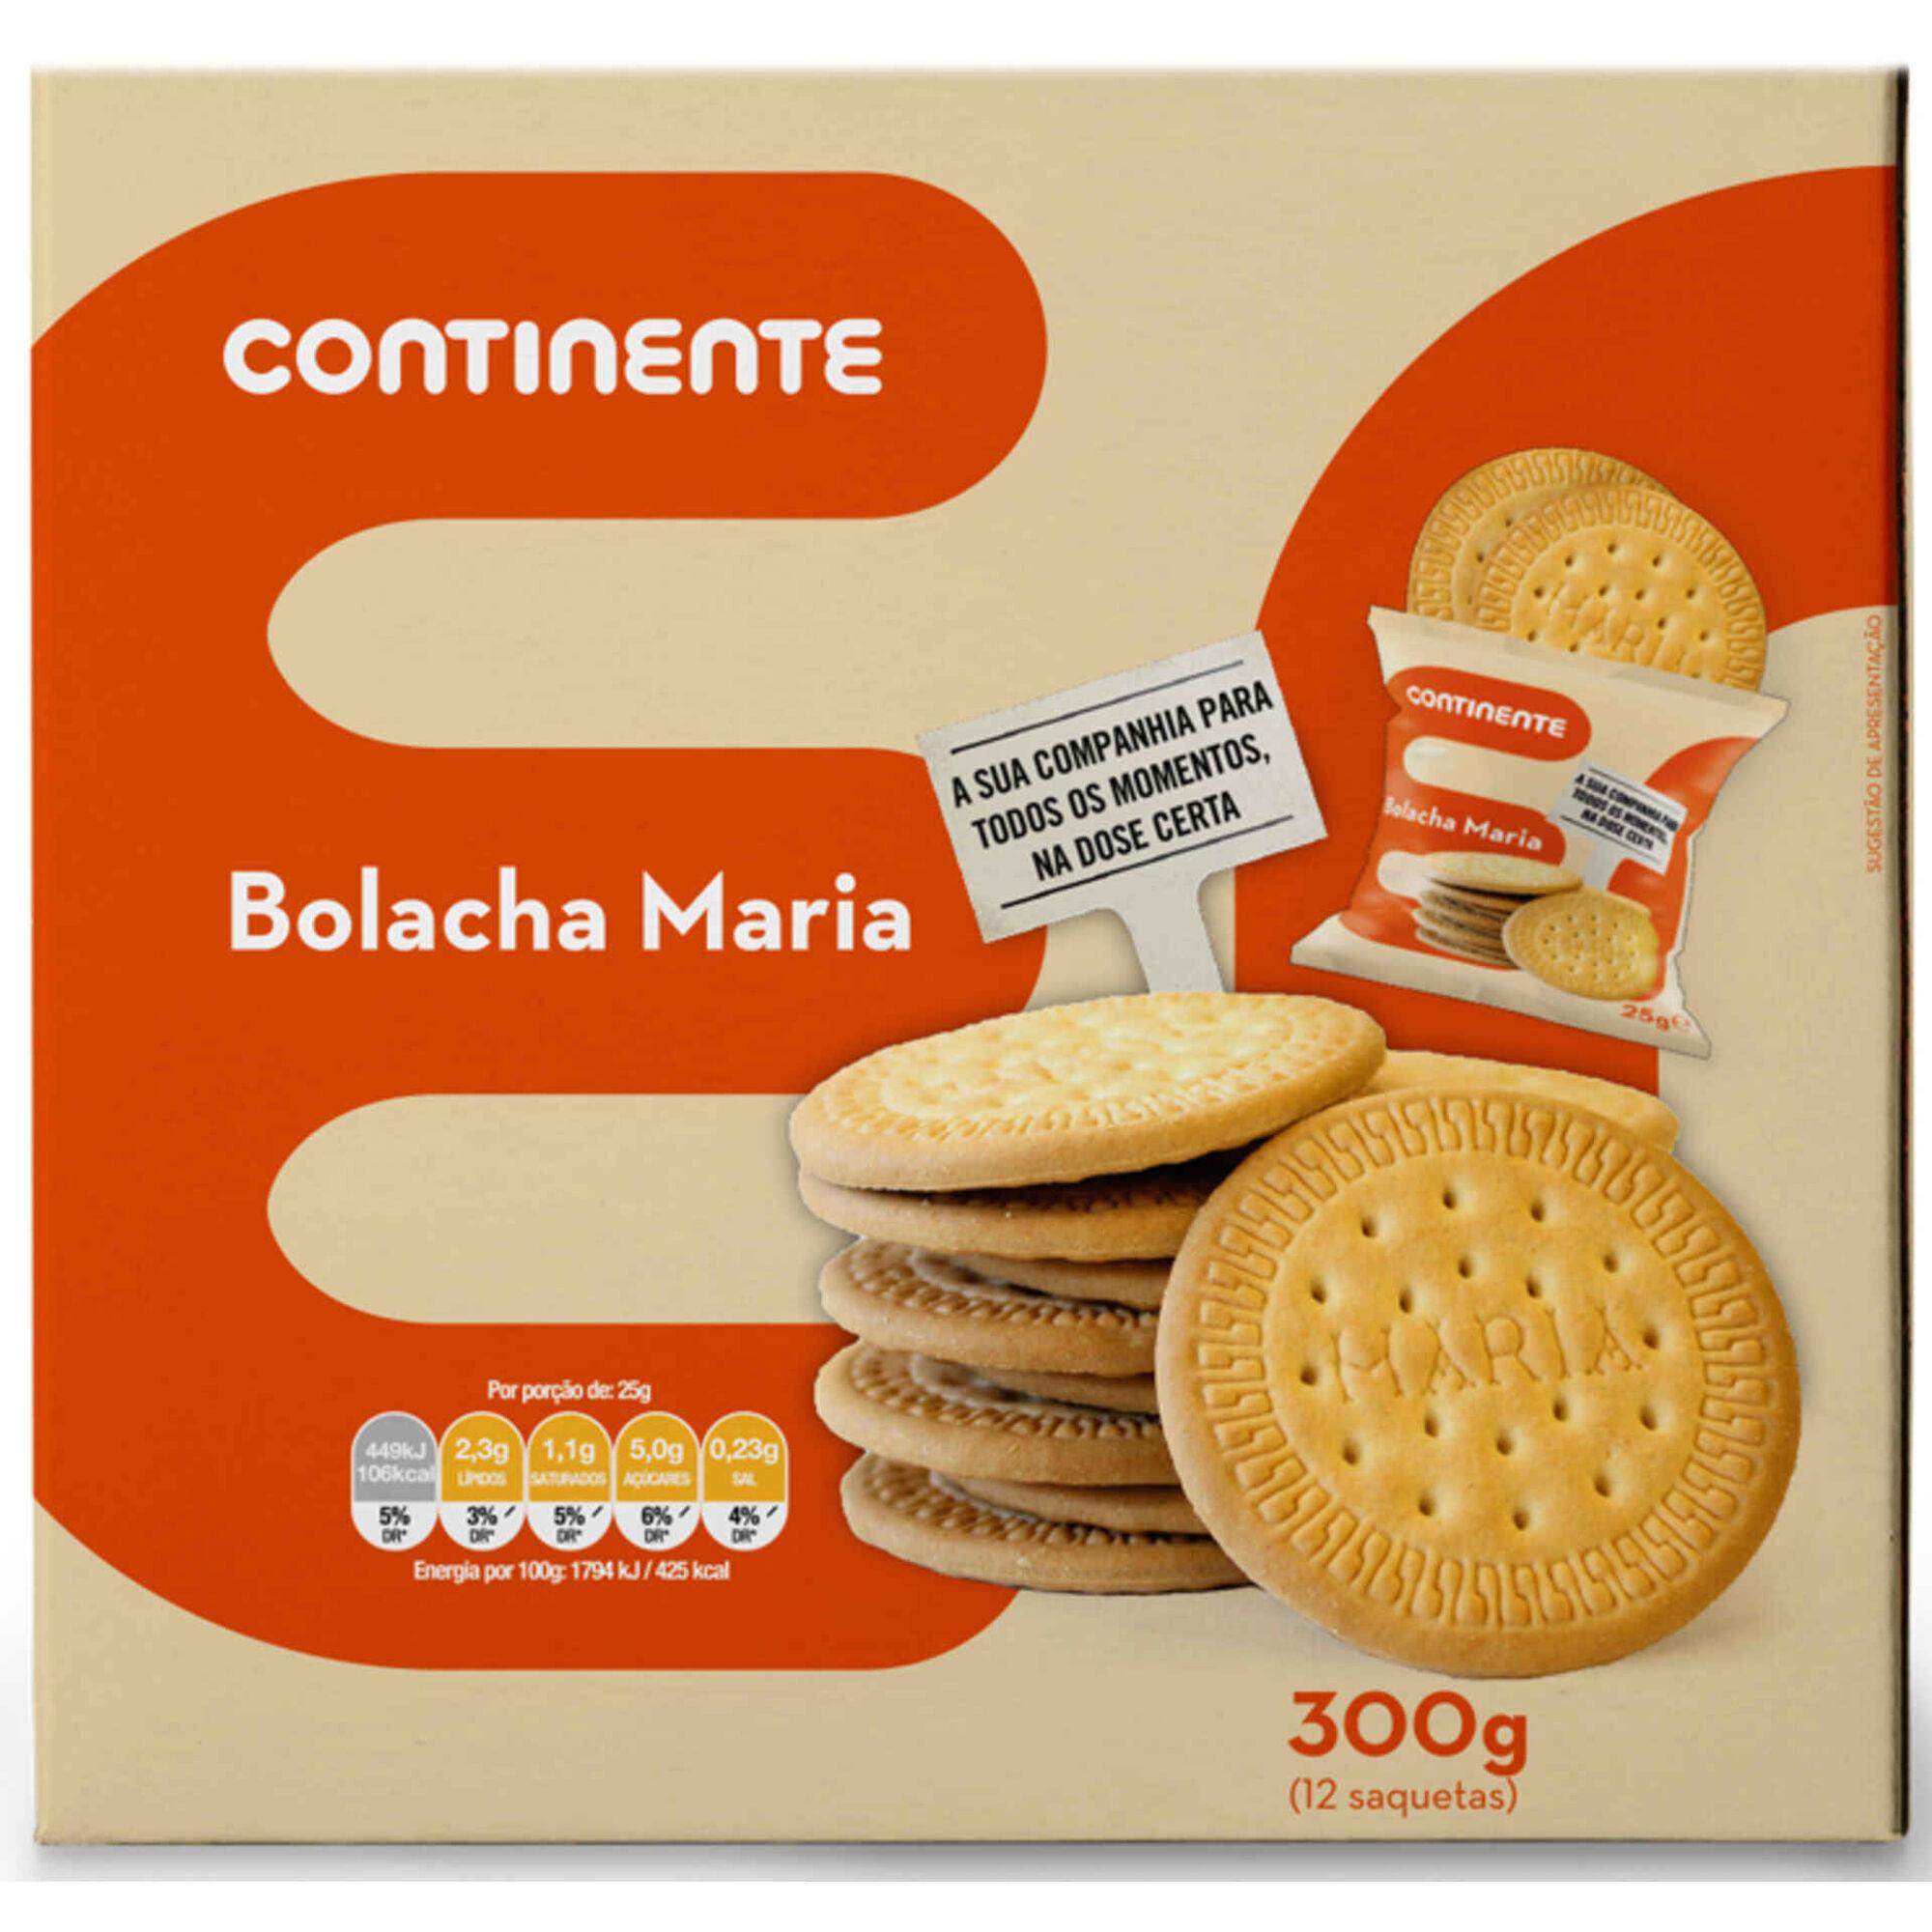 Bolachas Maria